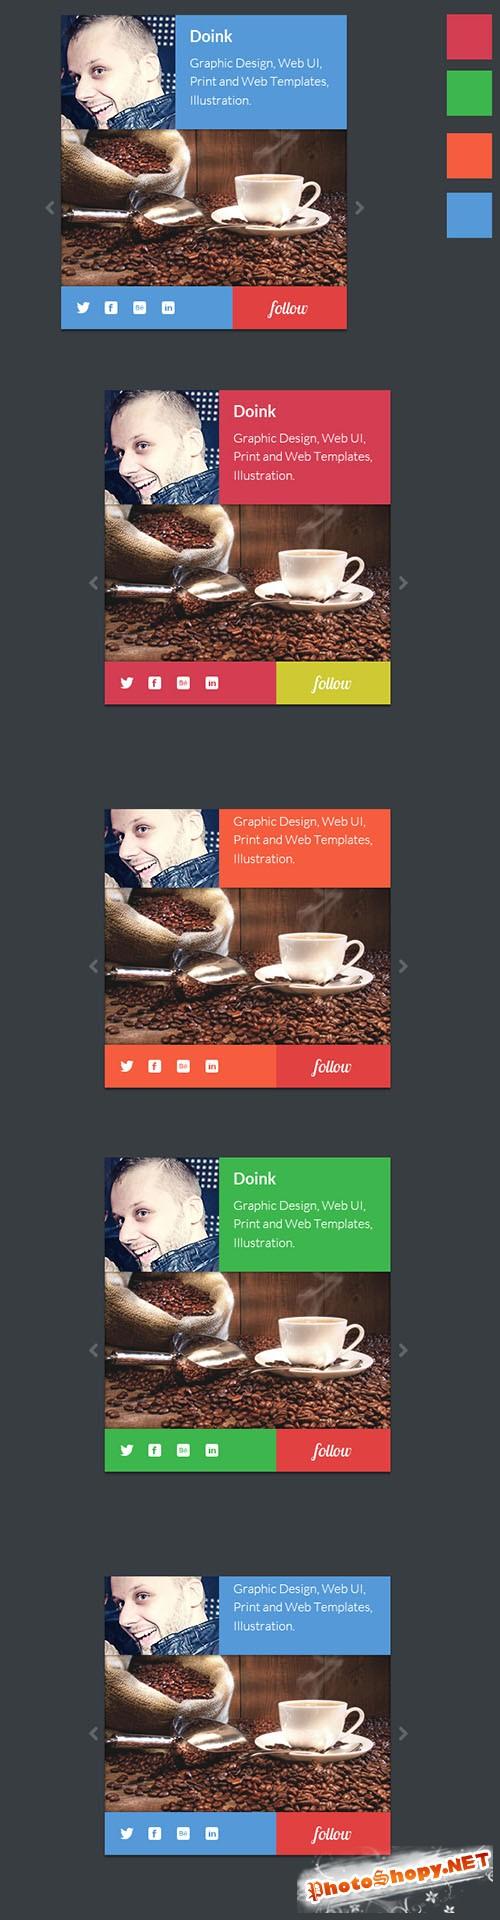 Designtnt - Flat Portfolio Widgets